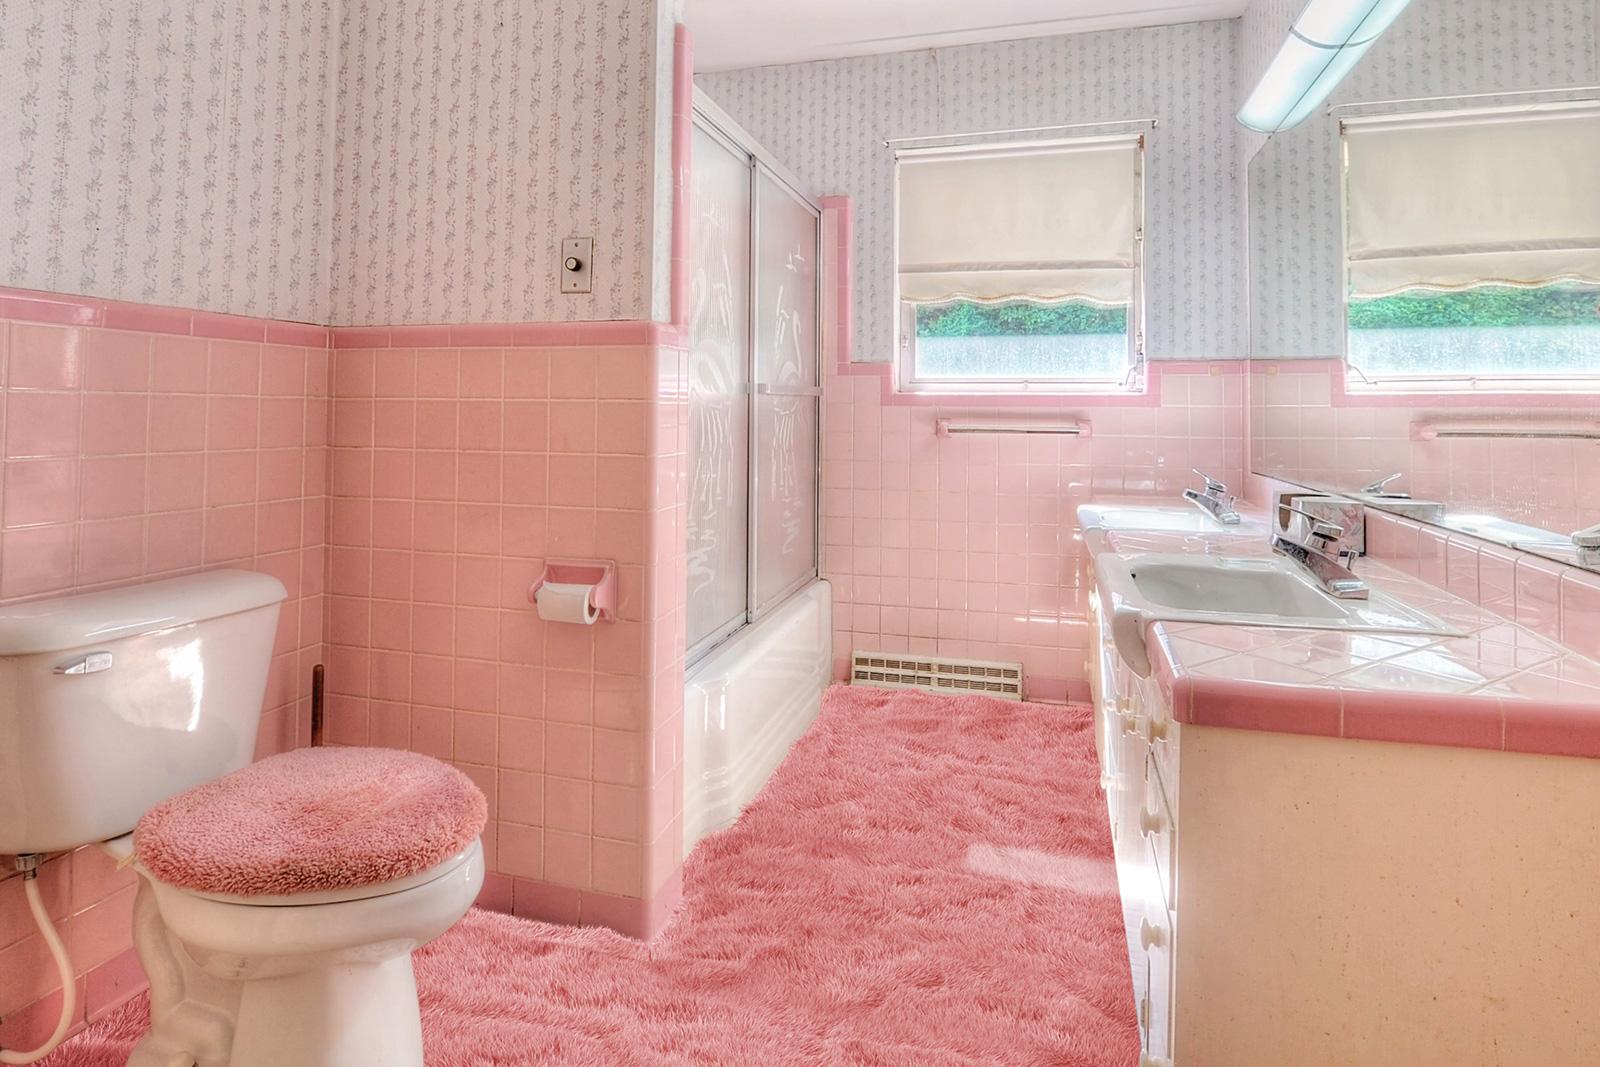 Retro pink grandma bathroom